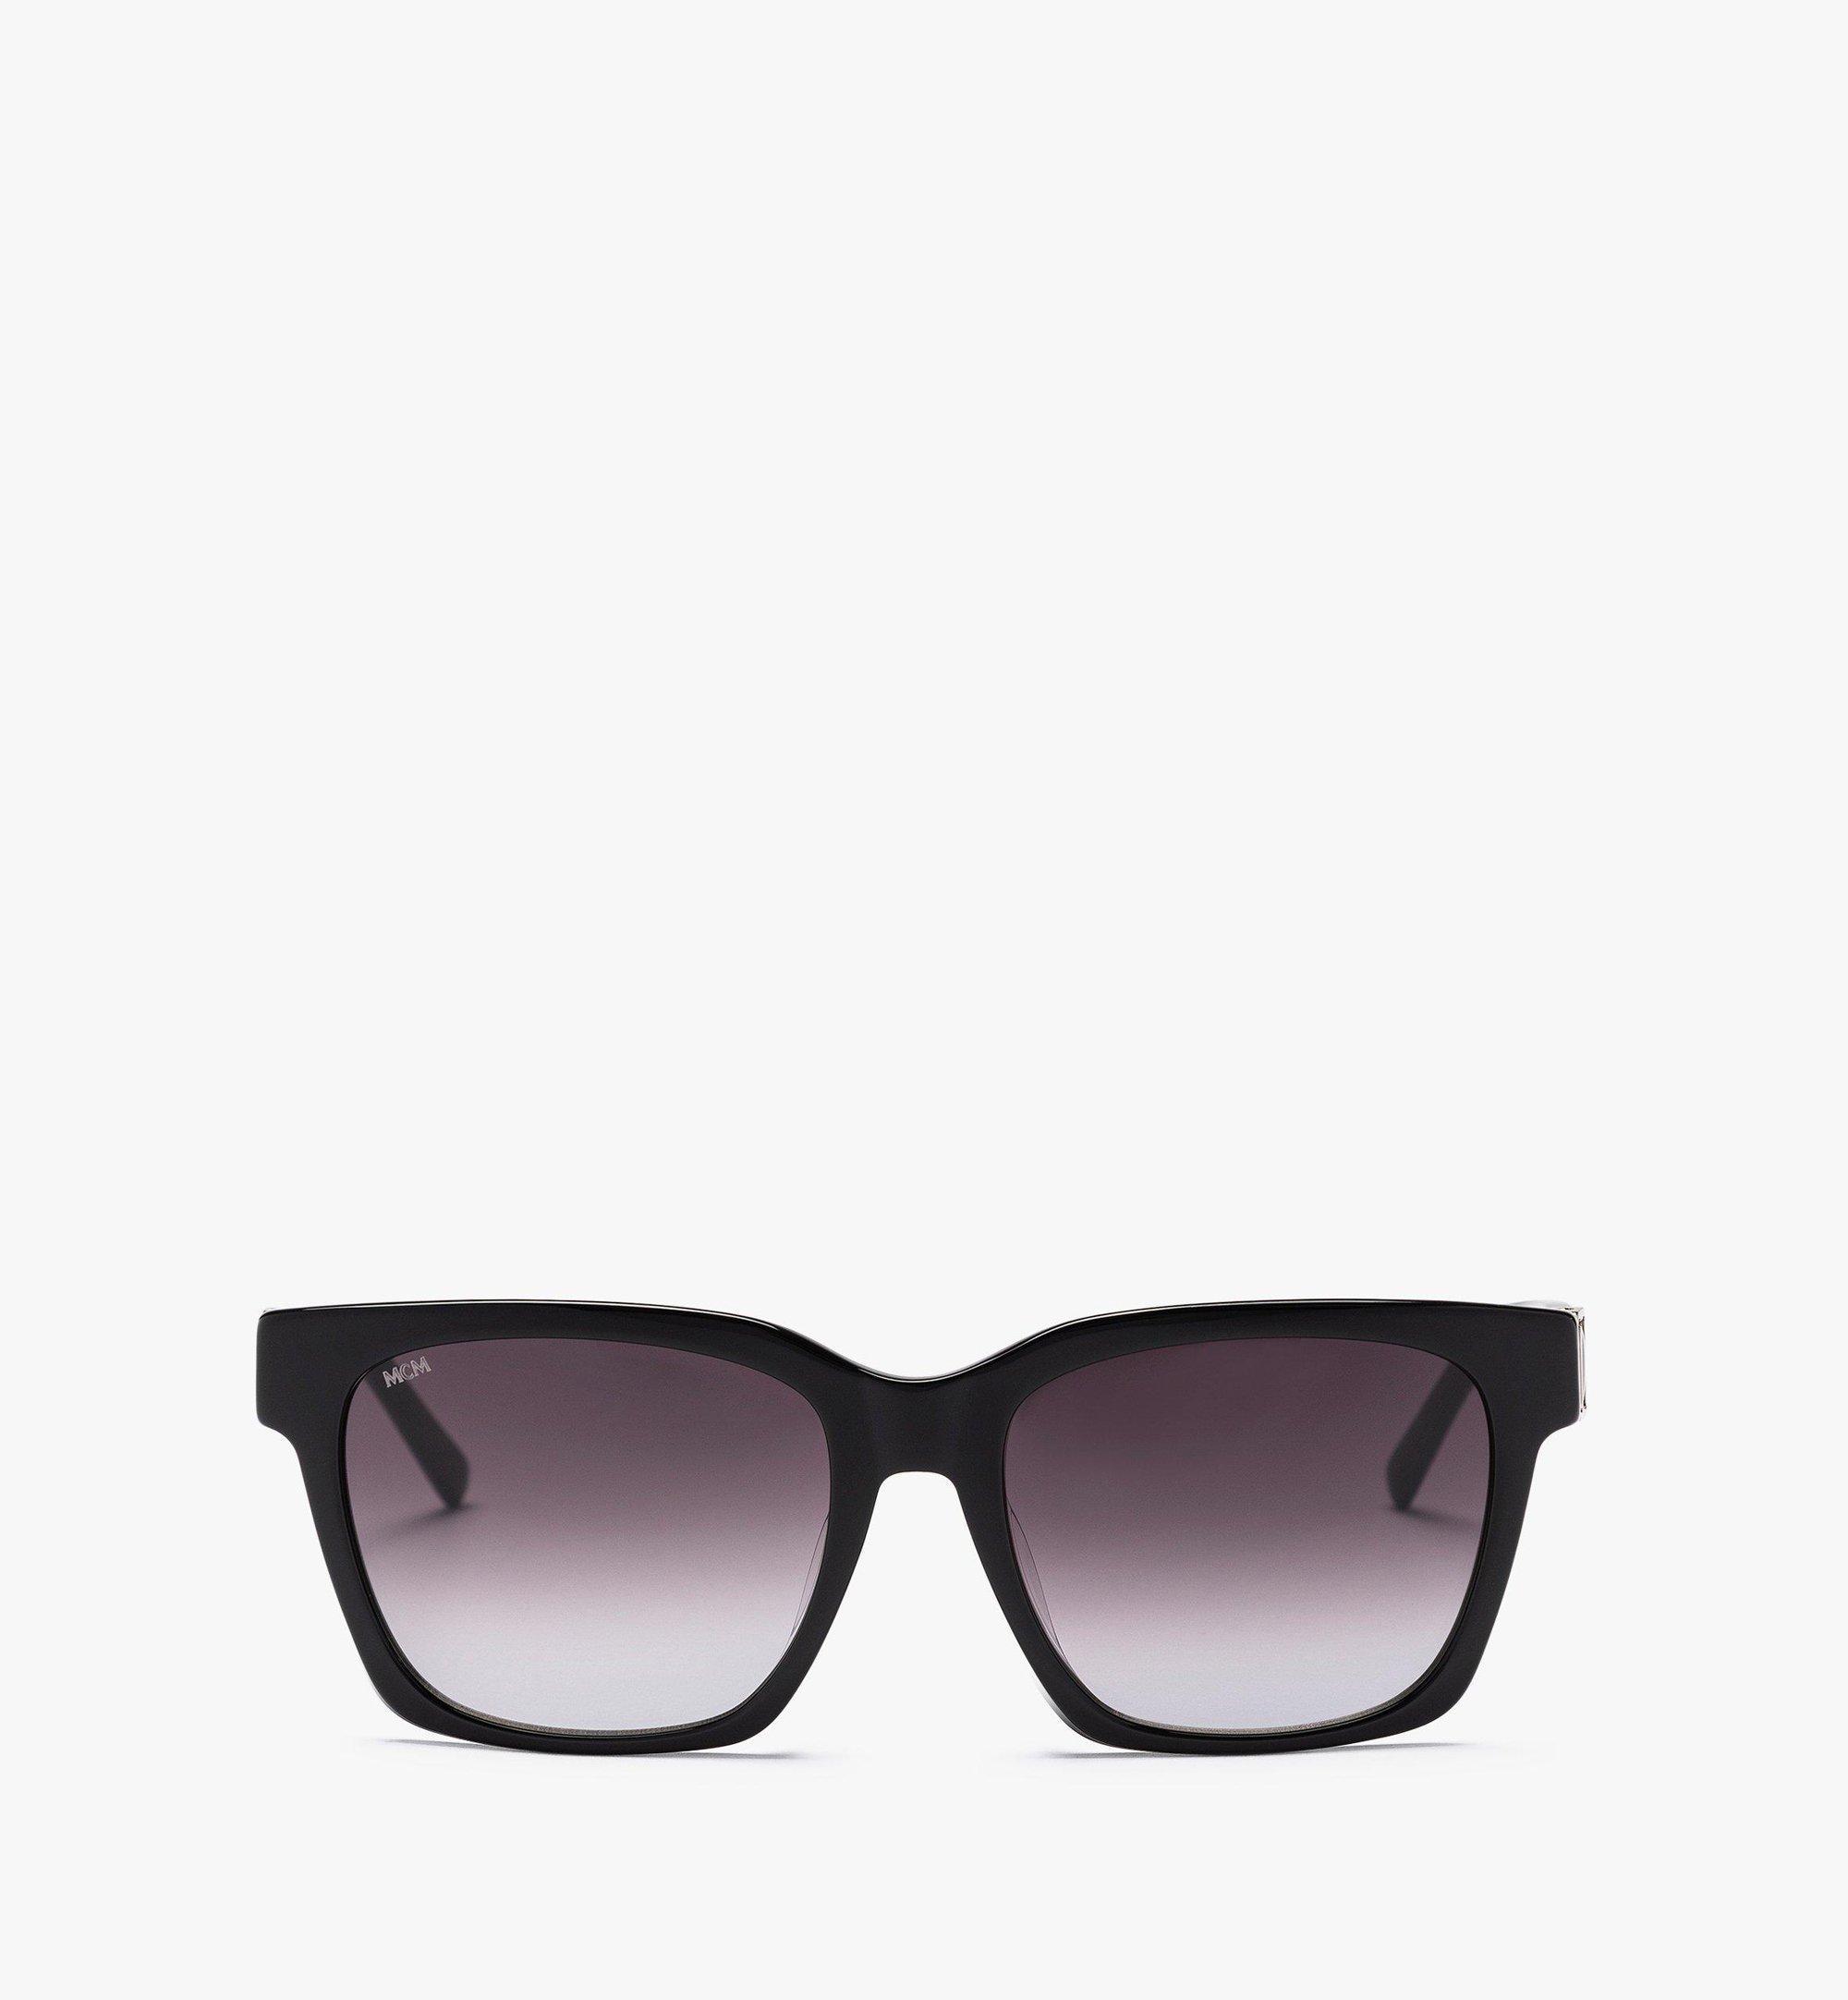 MCM MCM713SA Rectangular Sunglasses Black MEGBAMM09BK001 Alternate View 1